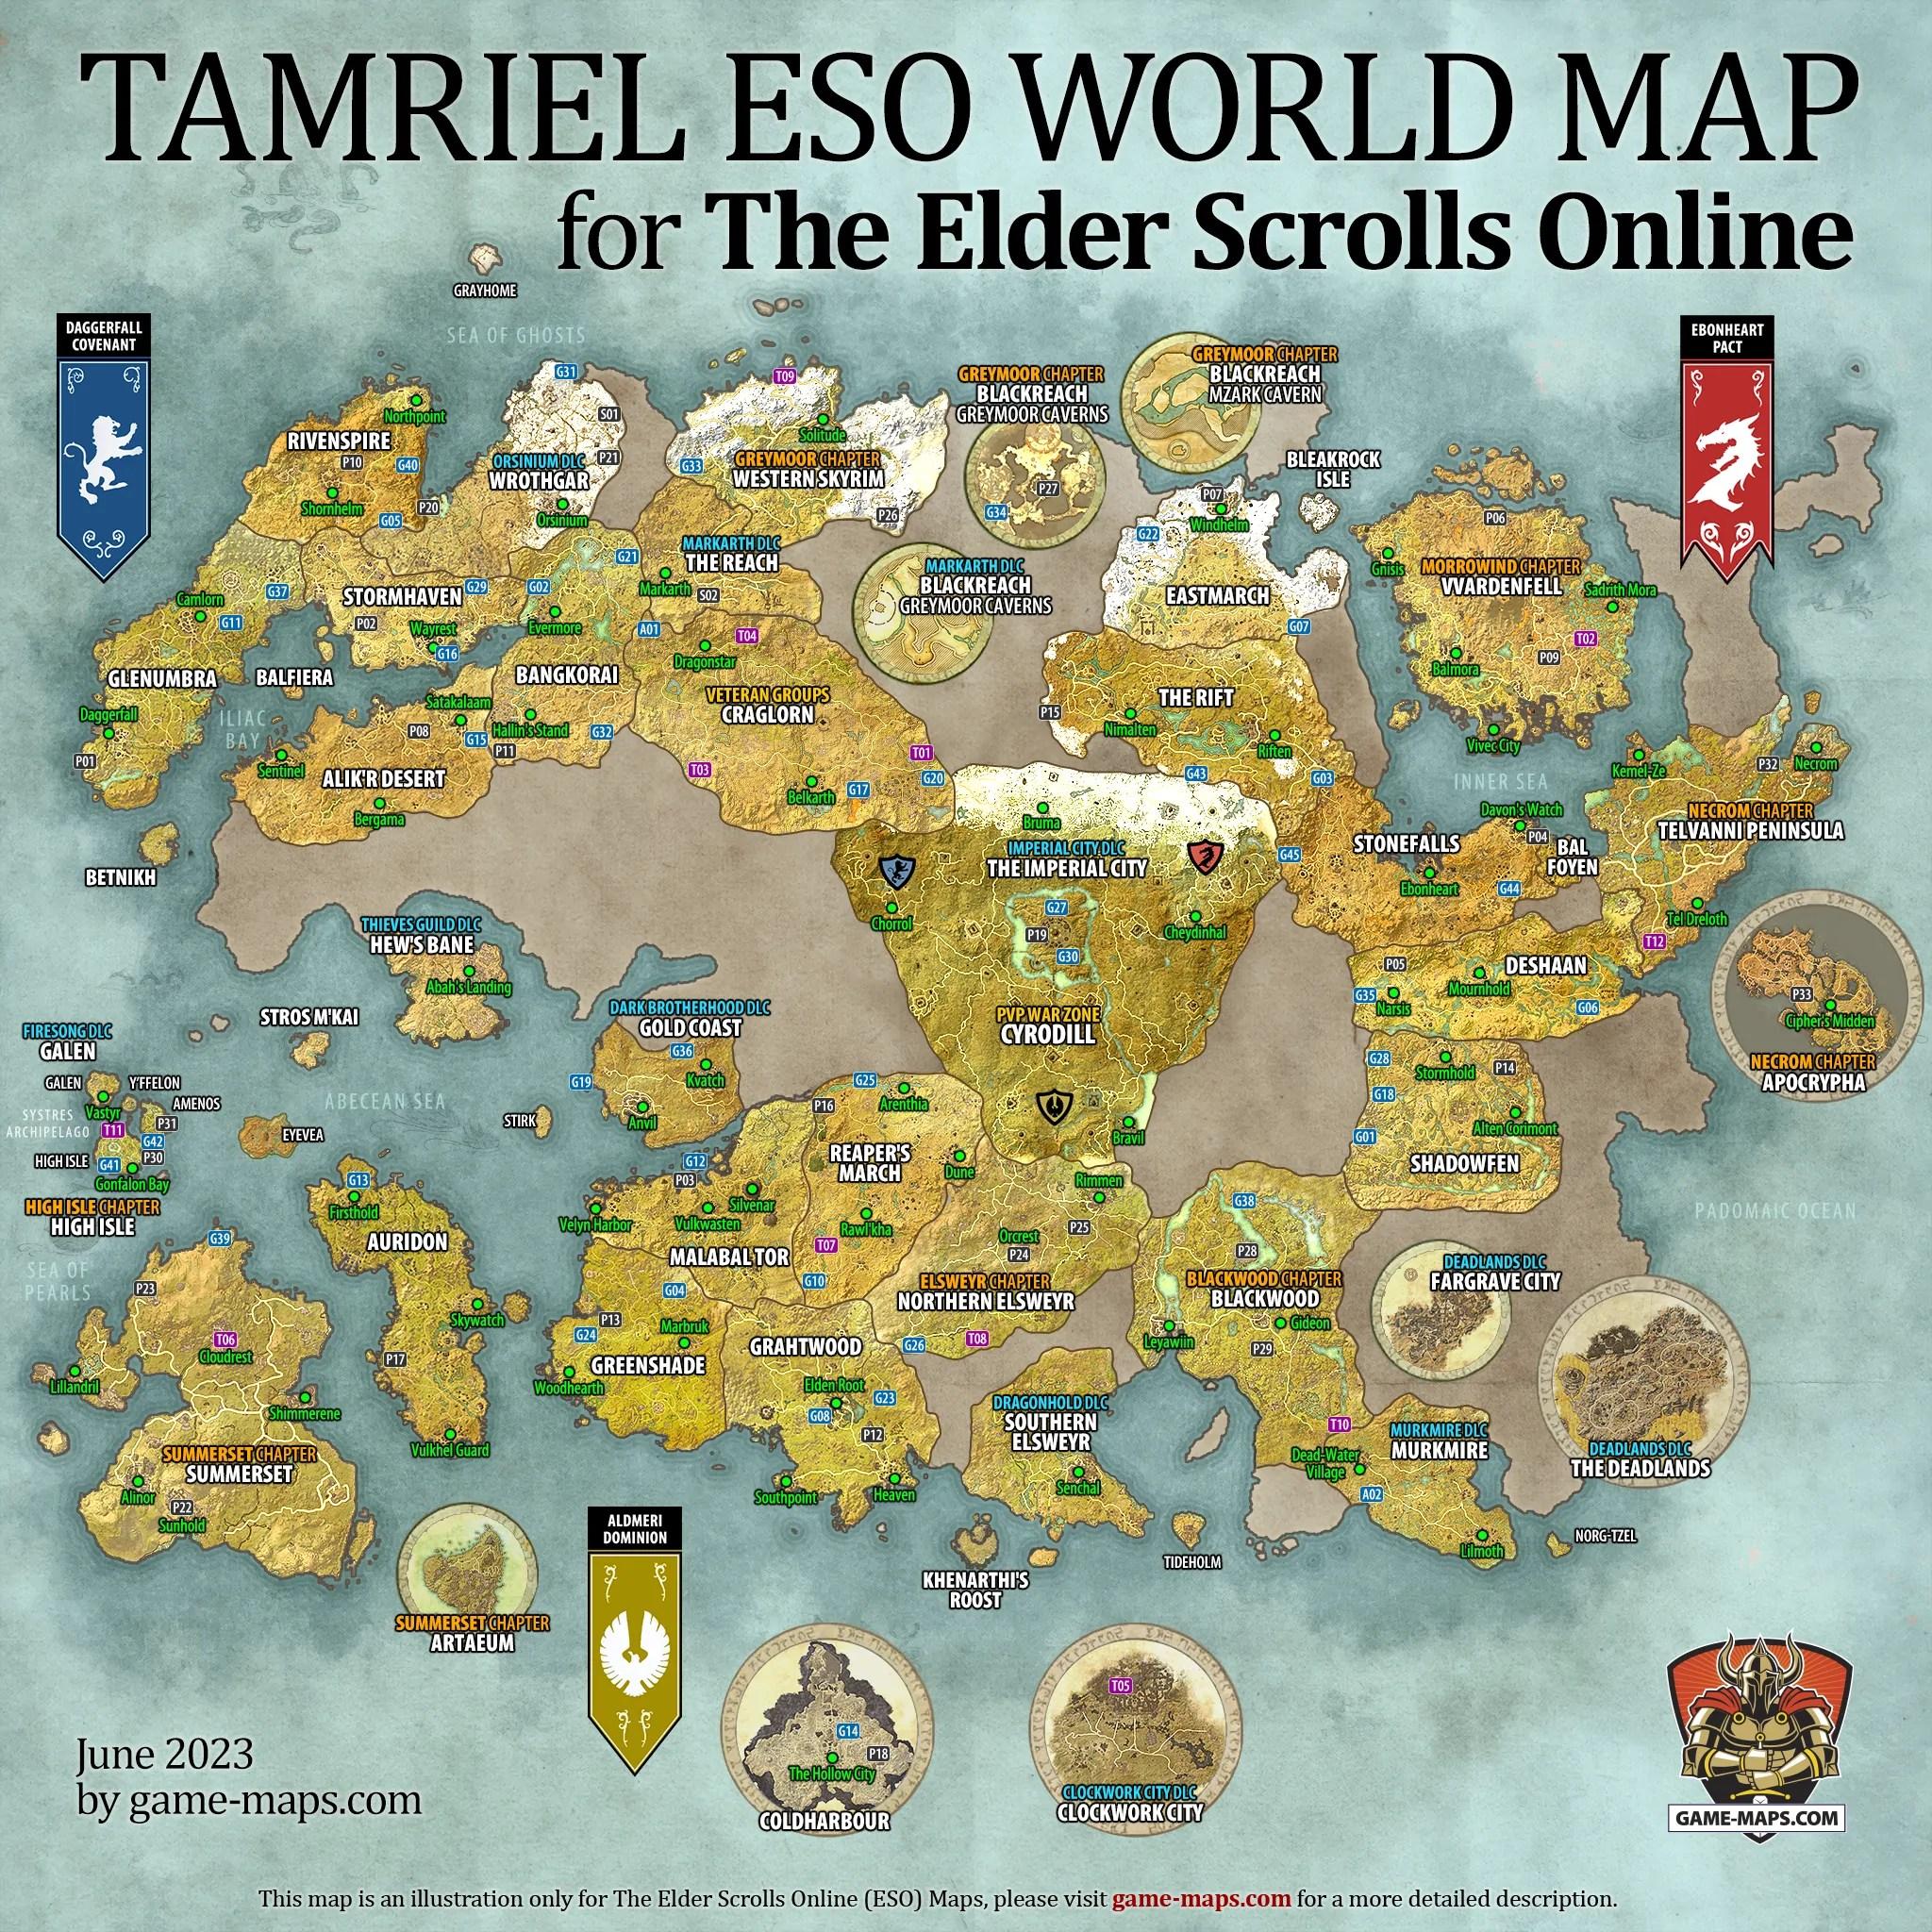 Eso Bangkorai Map : bangkorai, Potential, Player, Looking, Start, Game., Wondering, Possible, Hammerfell?, Elderscrollsonline